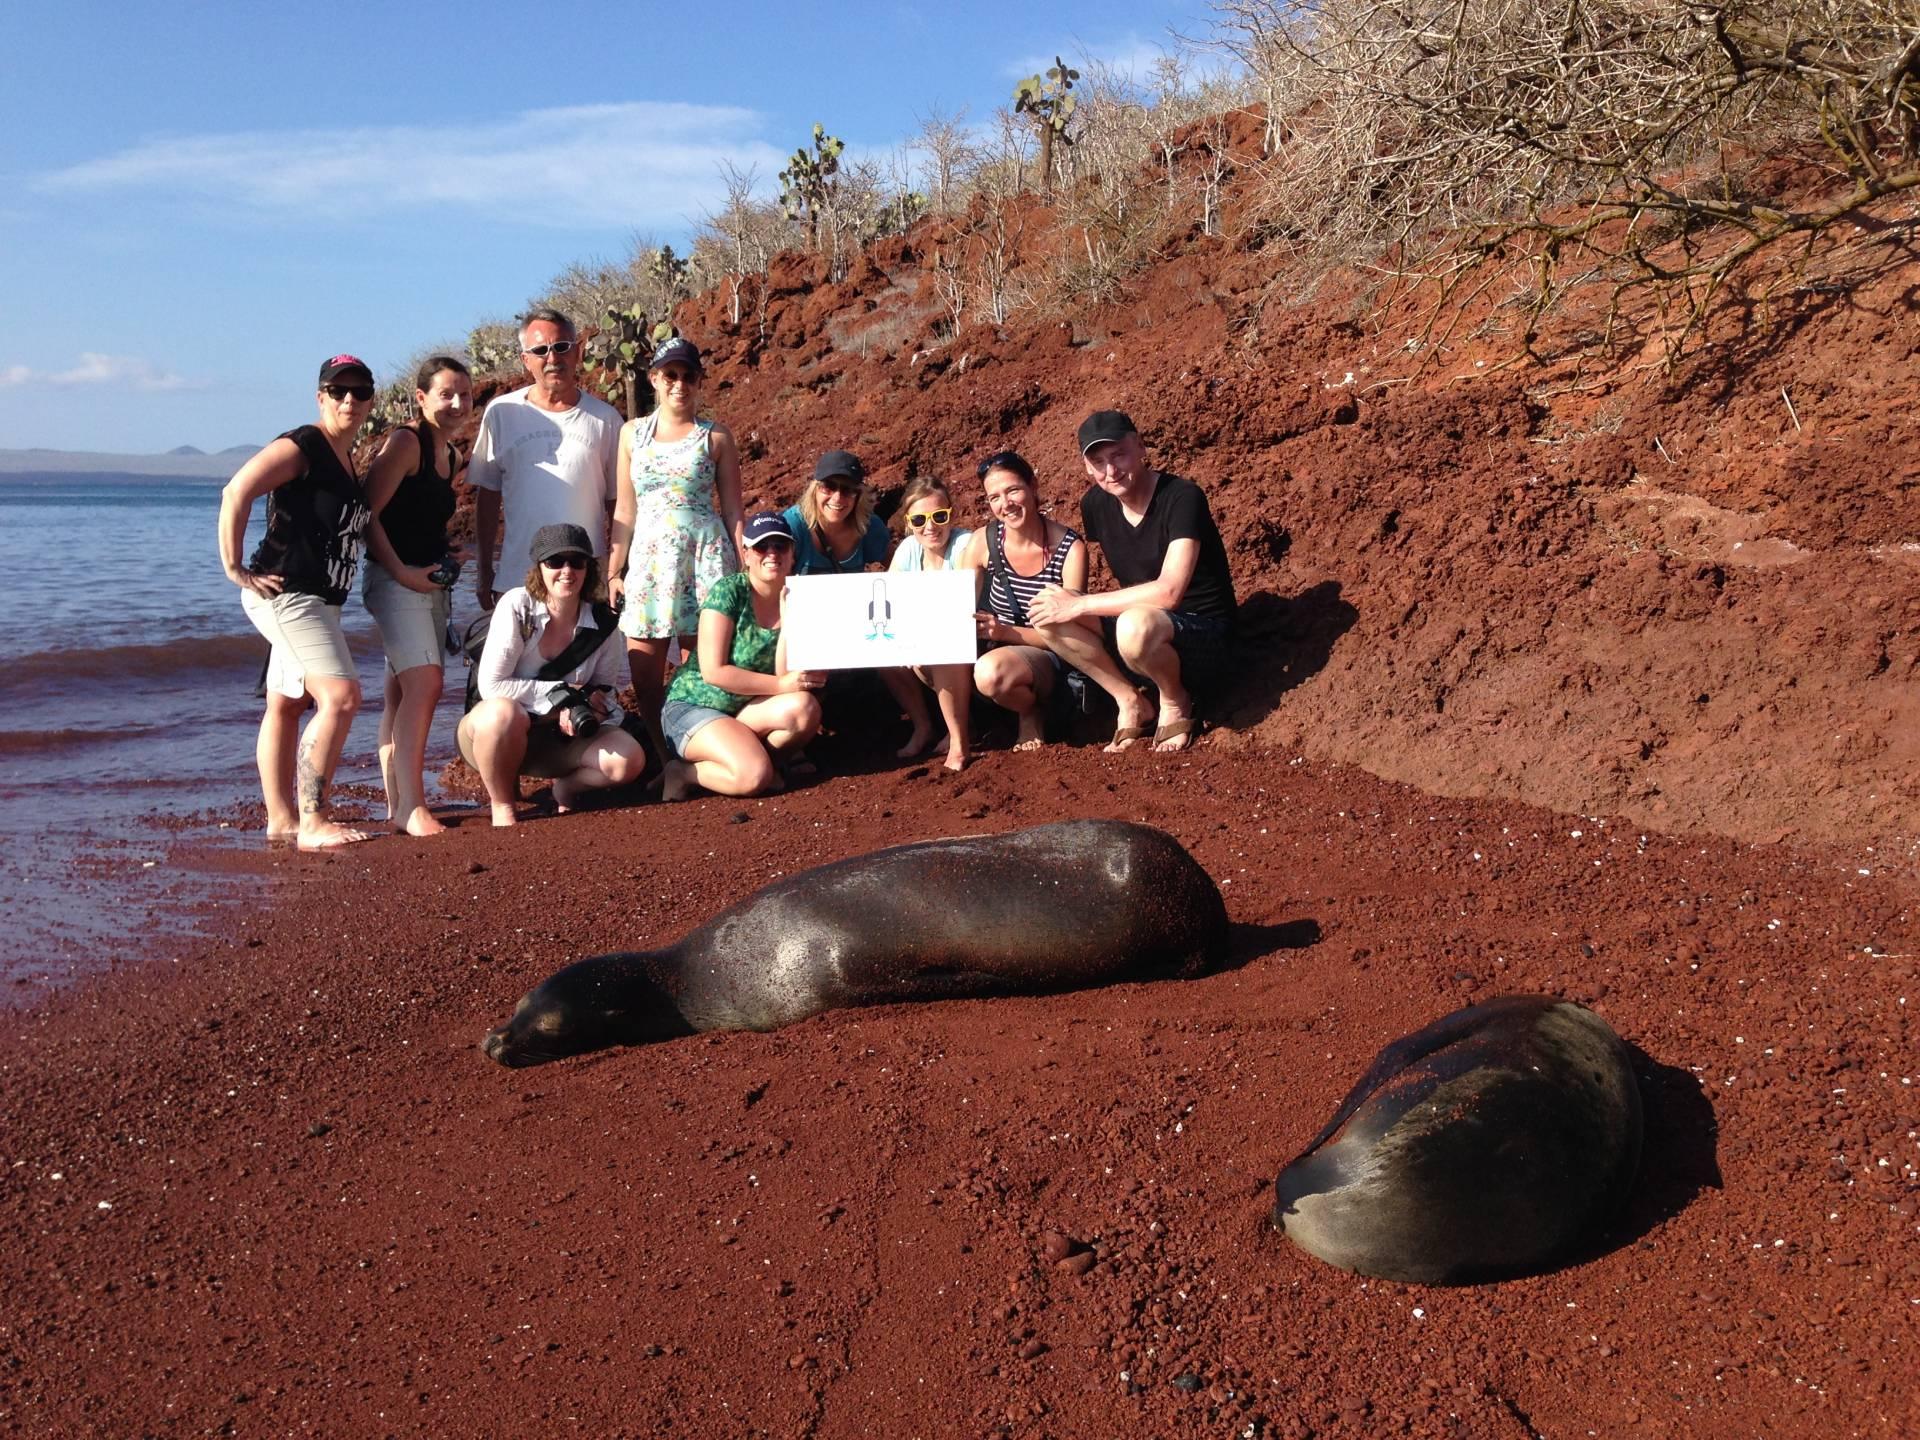 Ausflug auf die Insel Insel Rábida - Galapagos PRO und Partner Reisebüros